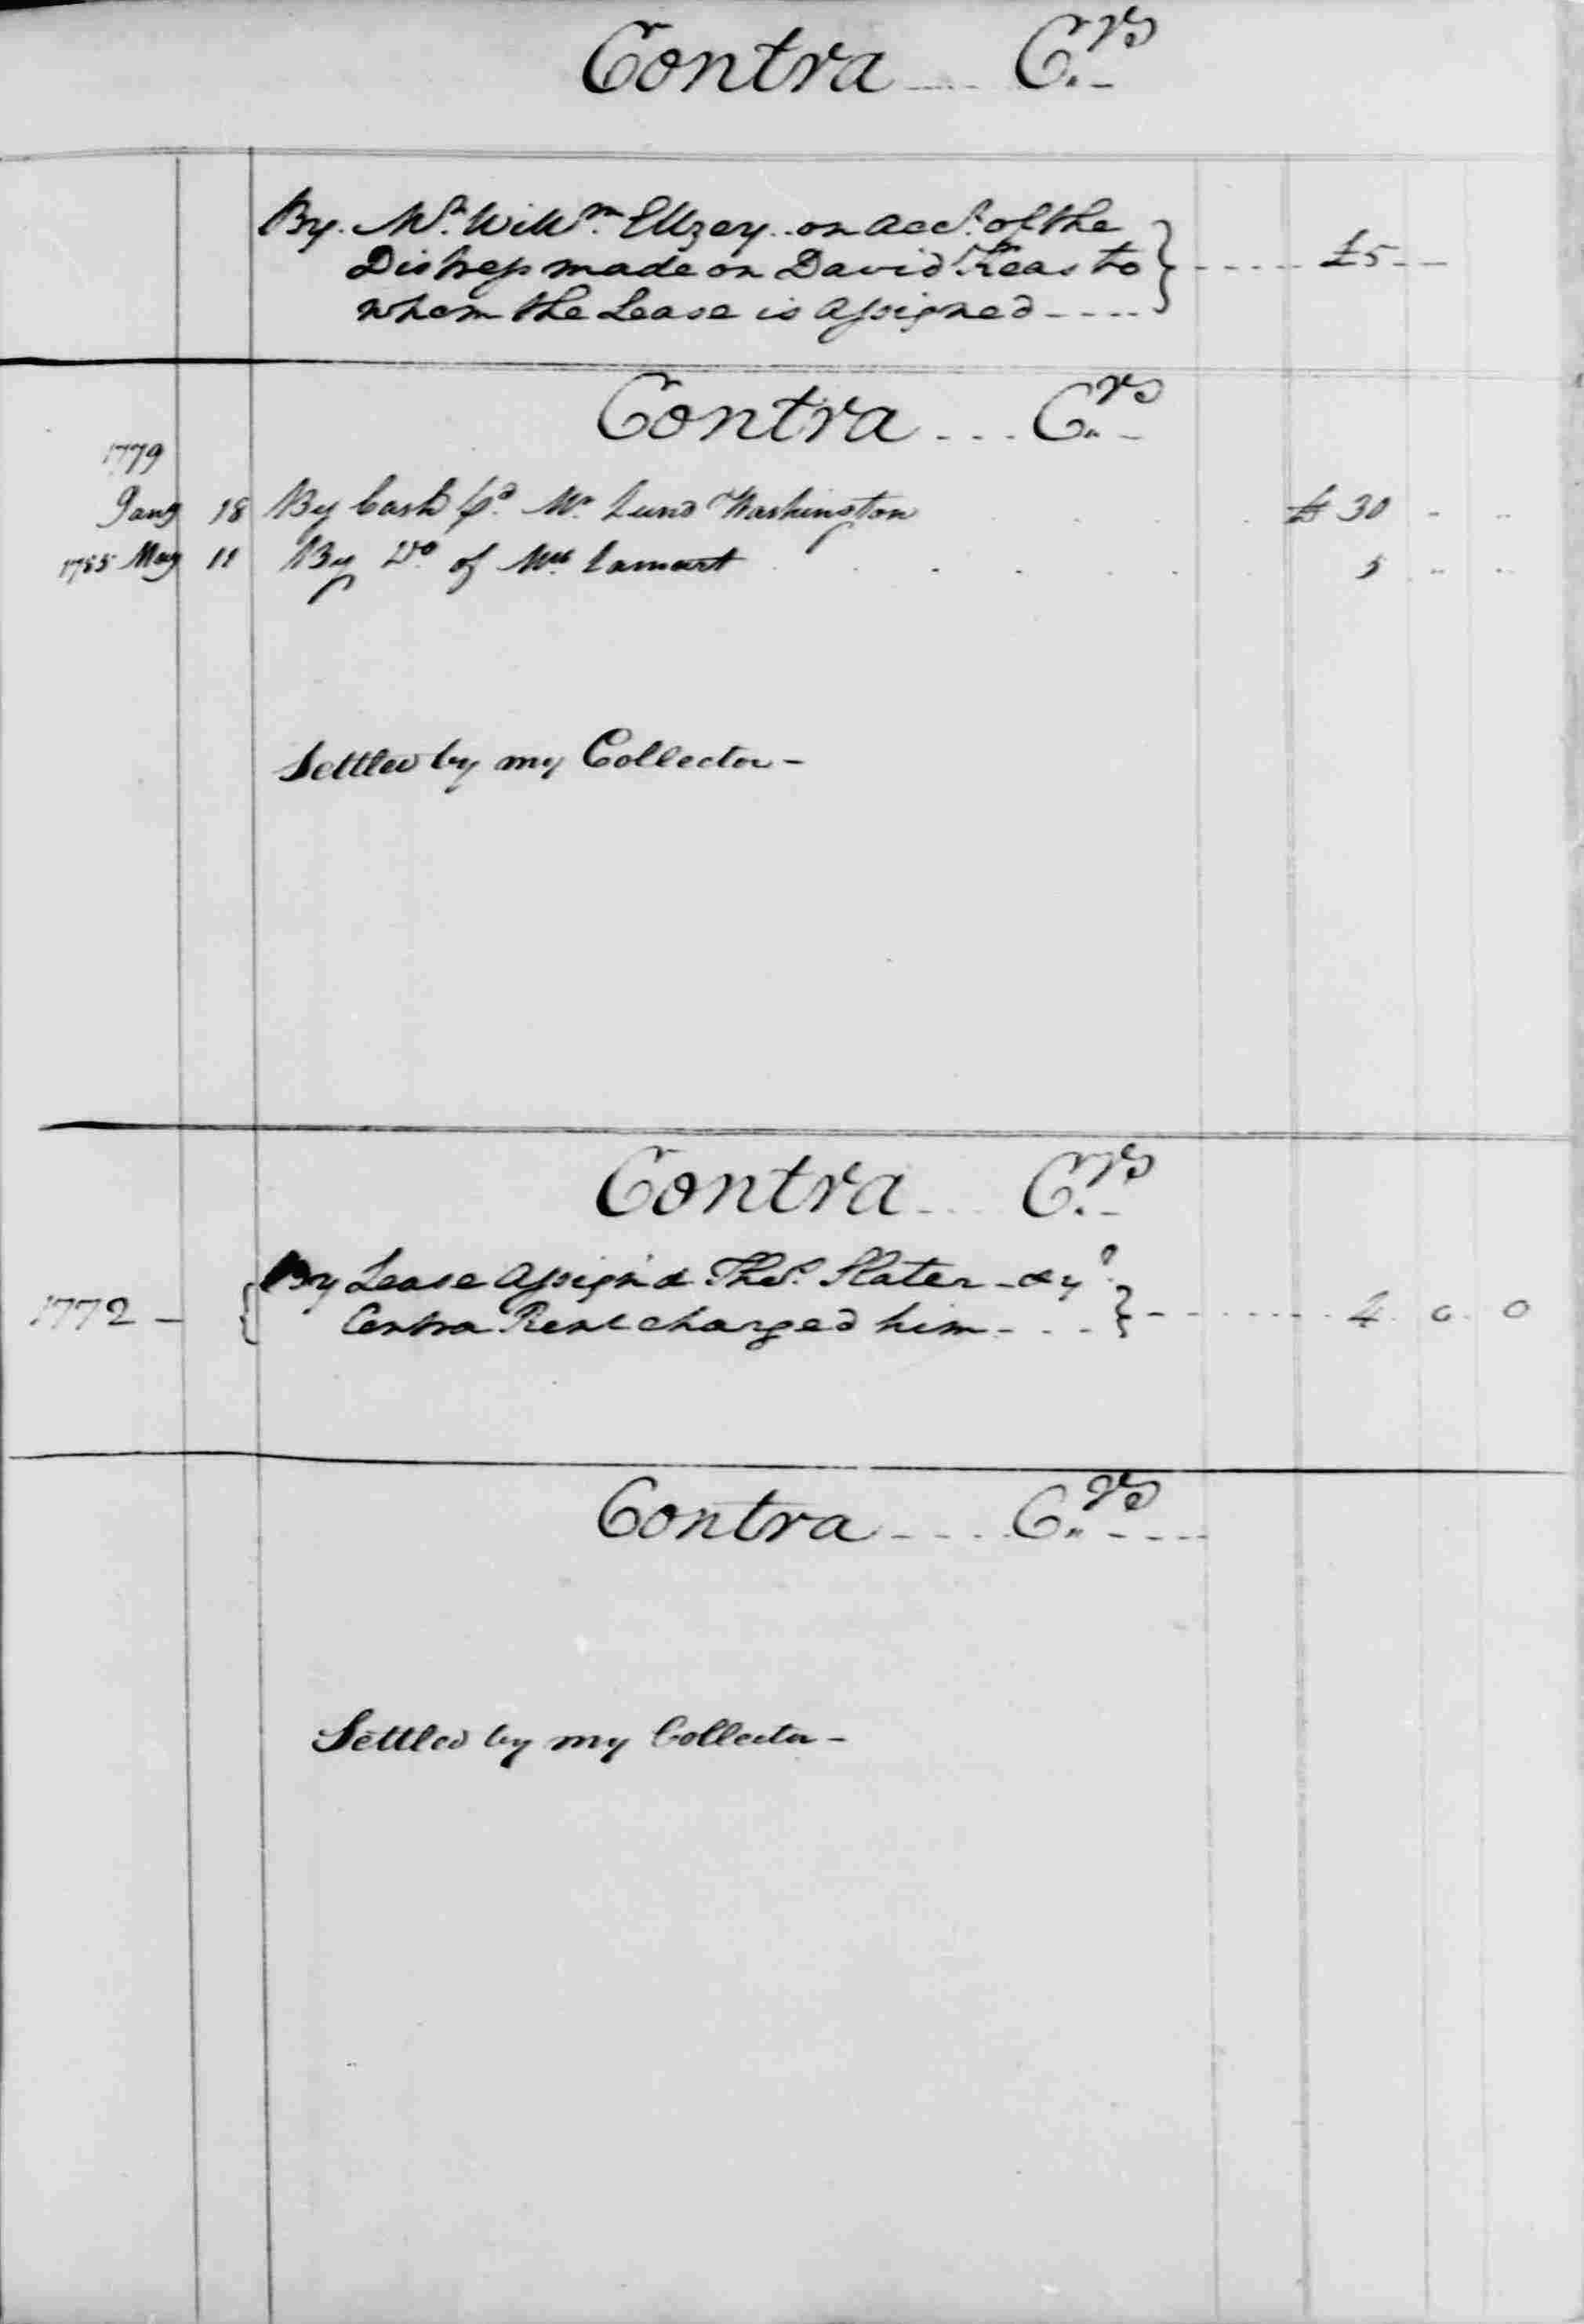 Ledger B, folio 70, right side